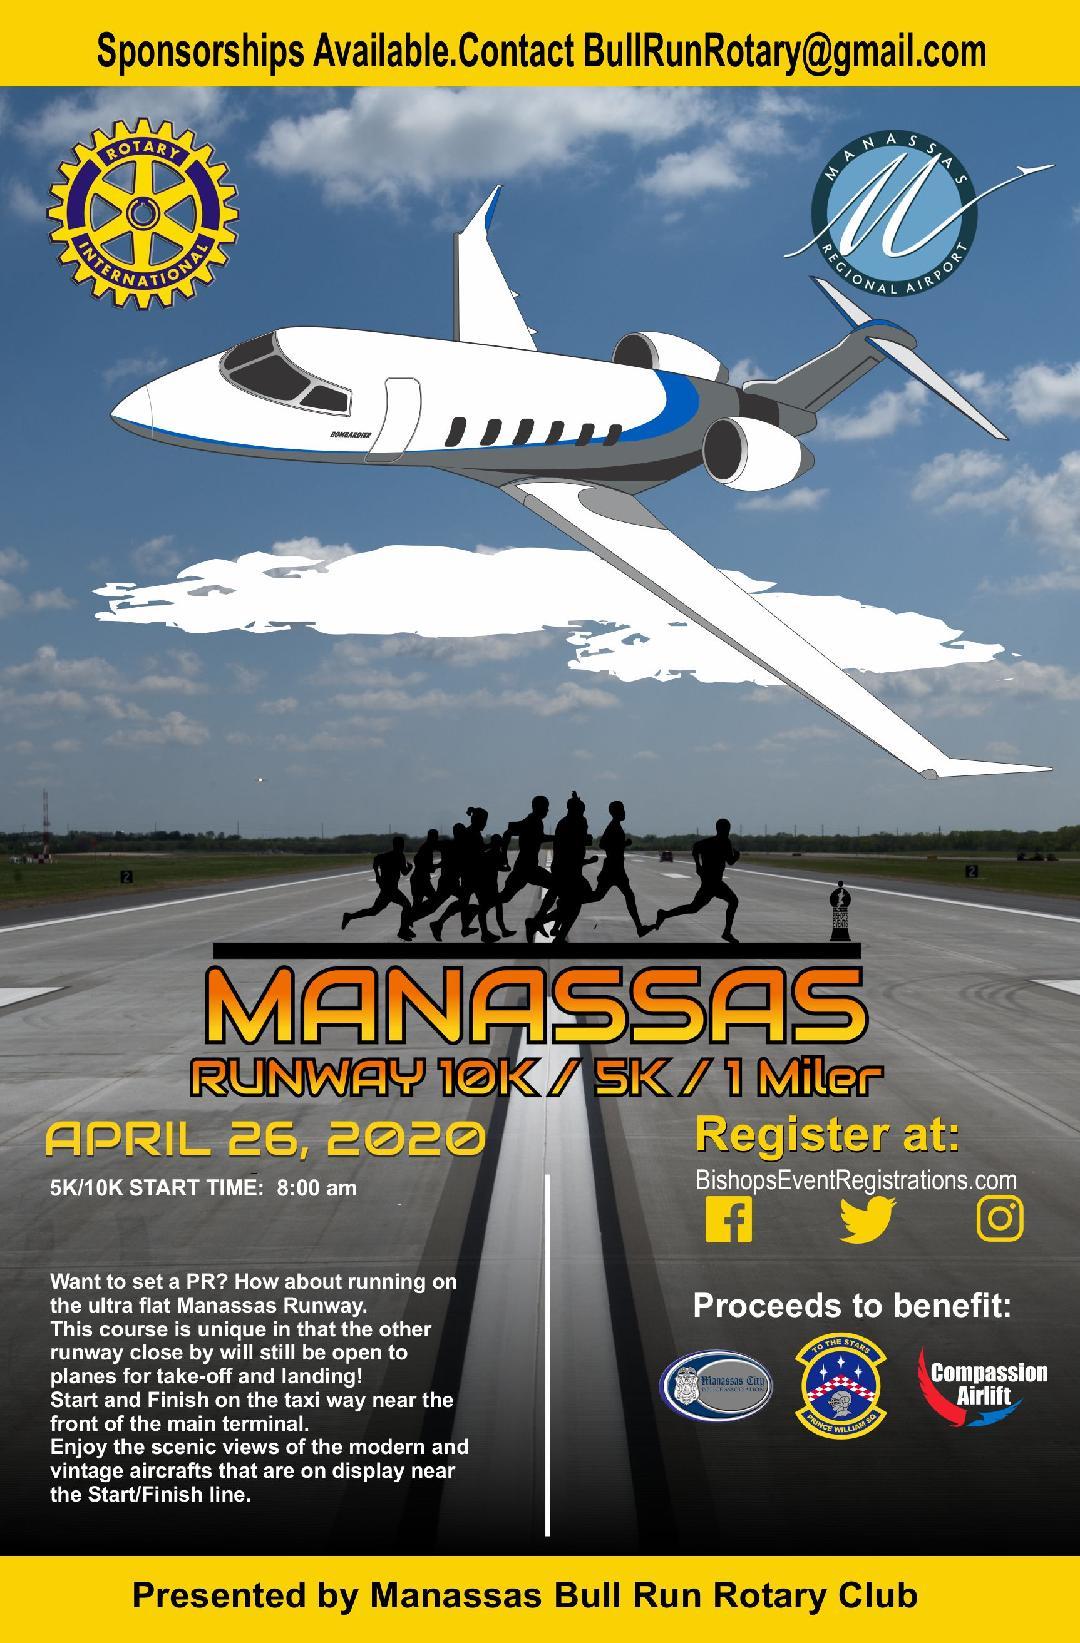 2020 Manassas Runway 5k, 10k, & 1M